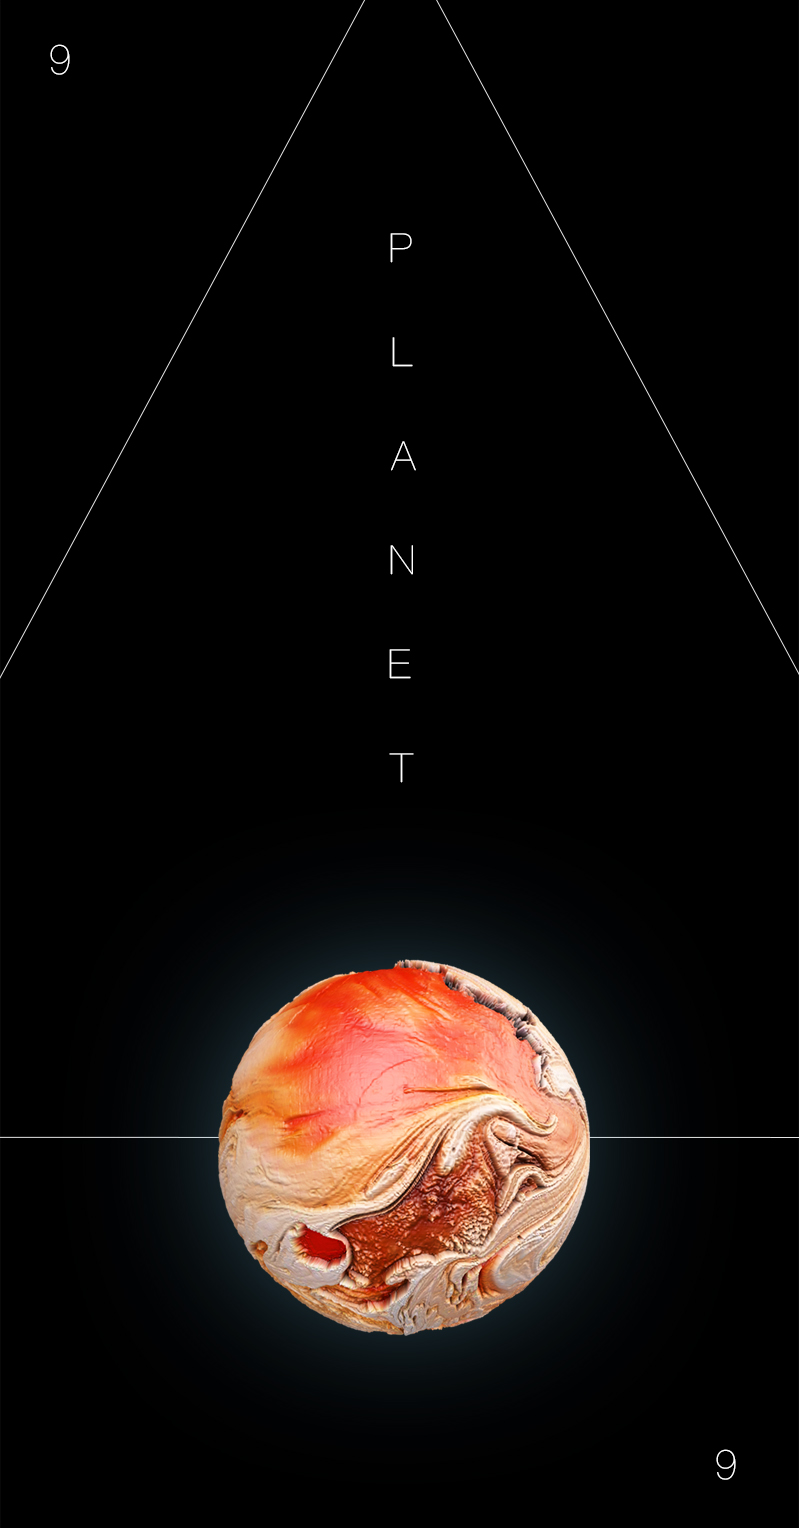 planet钢琴曲谱简谱